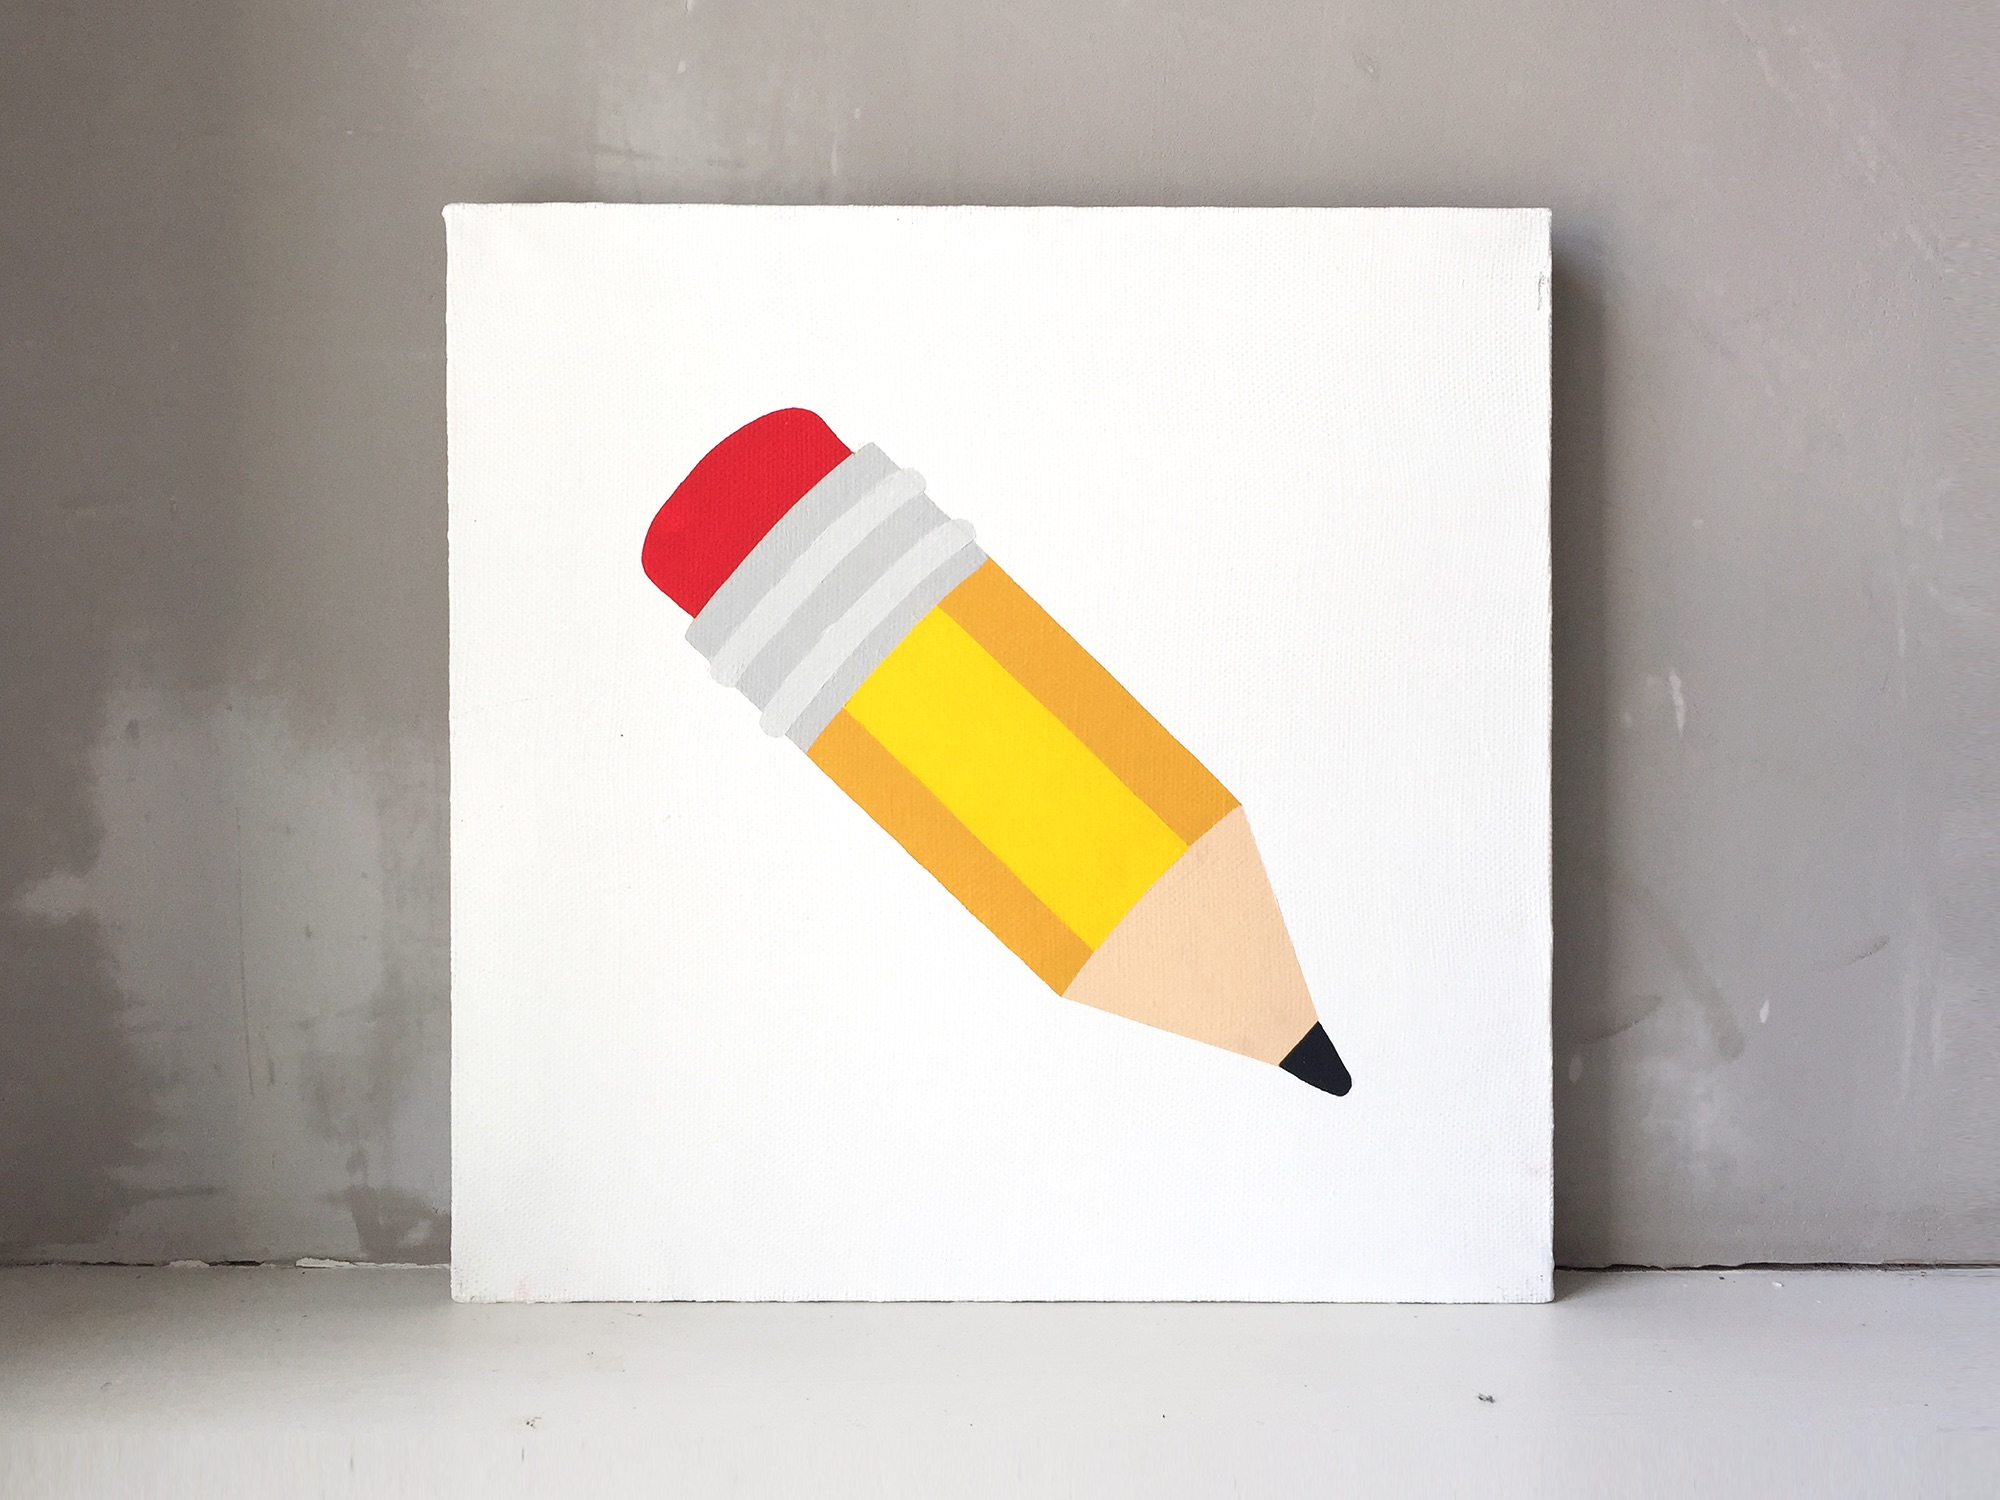 #creativity ✏️